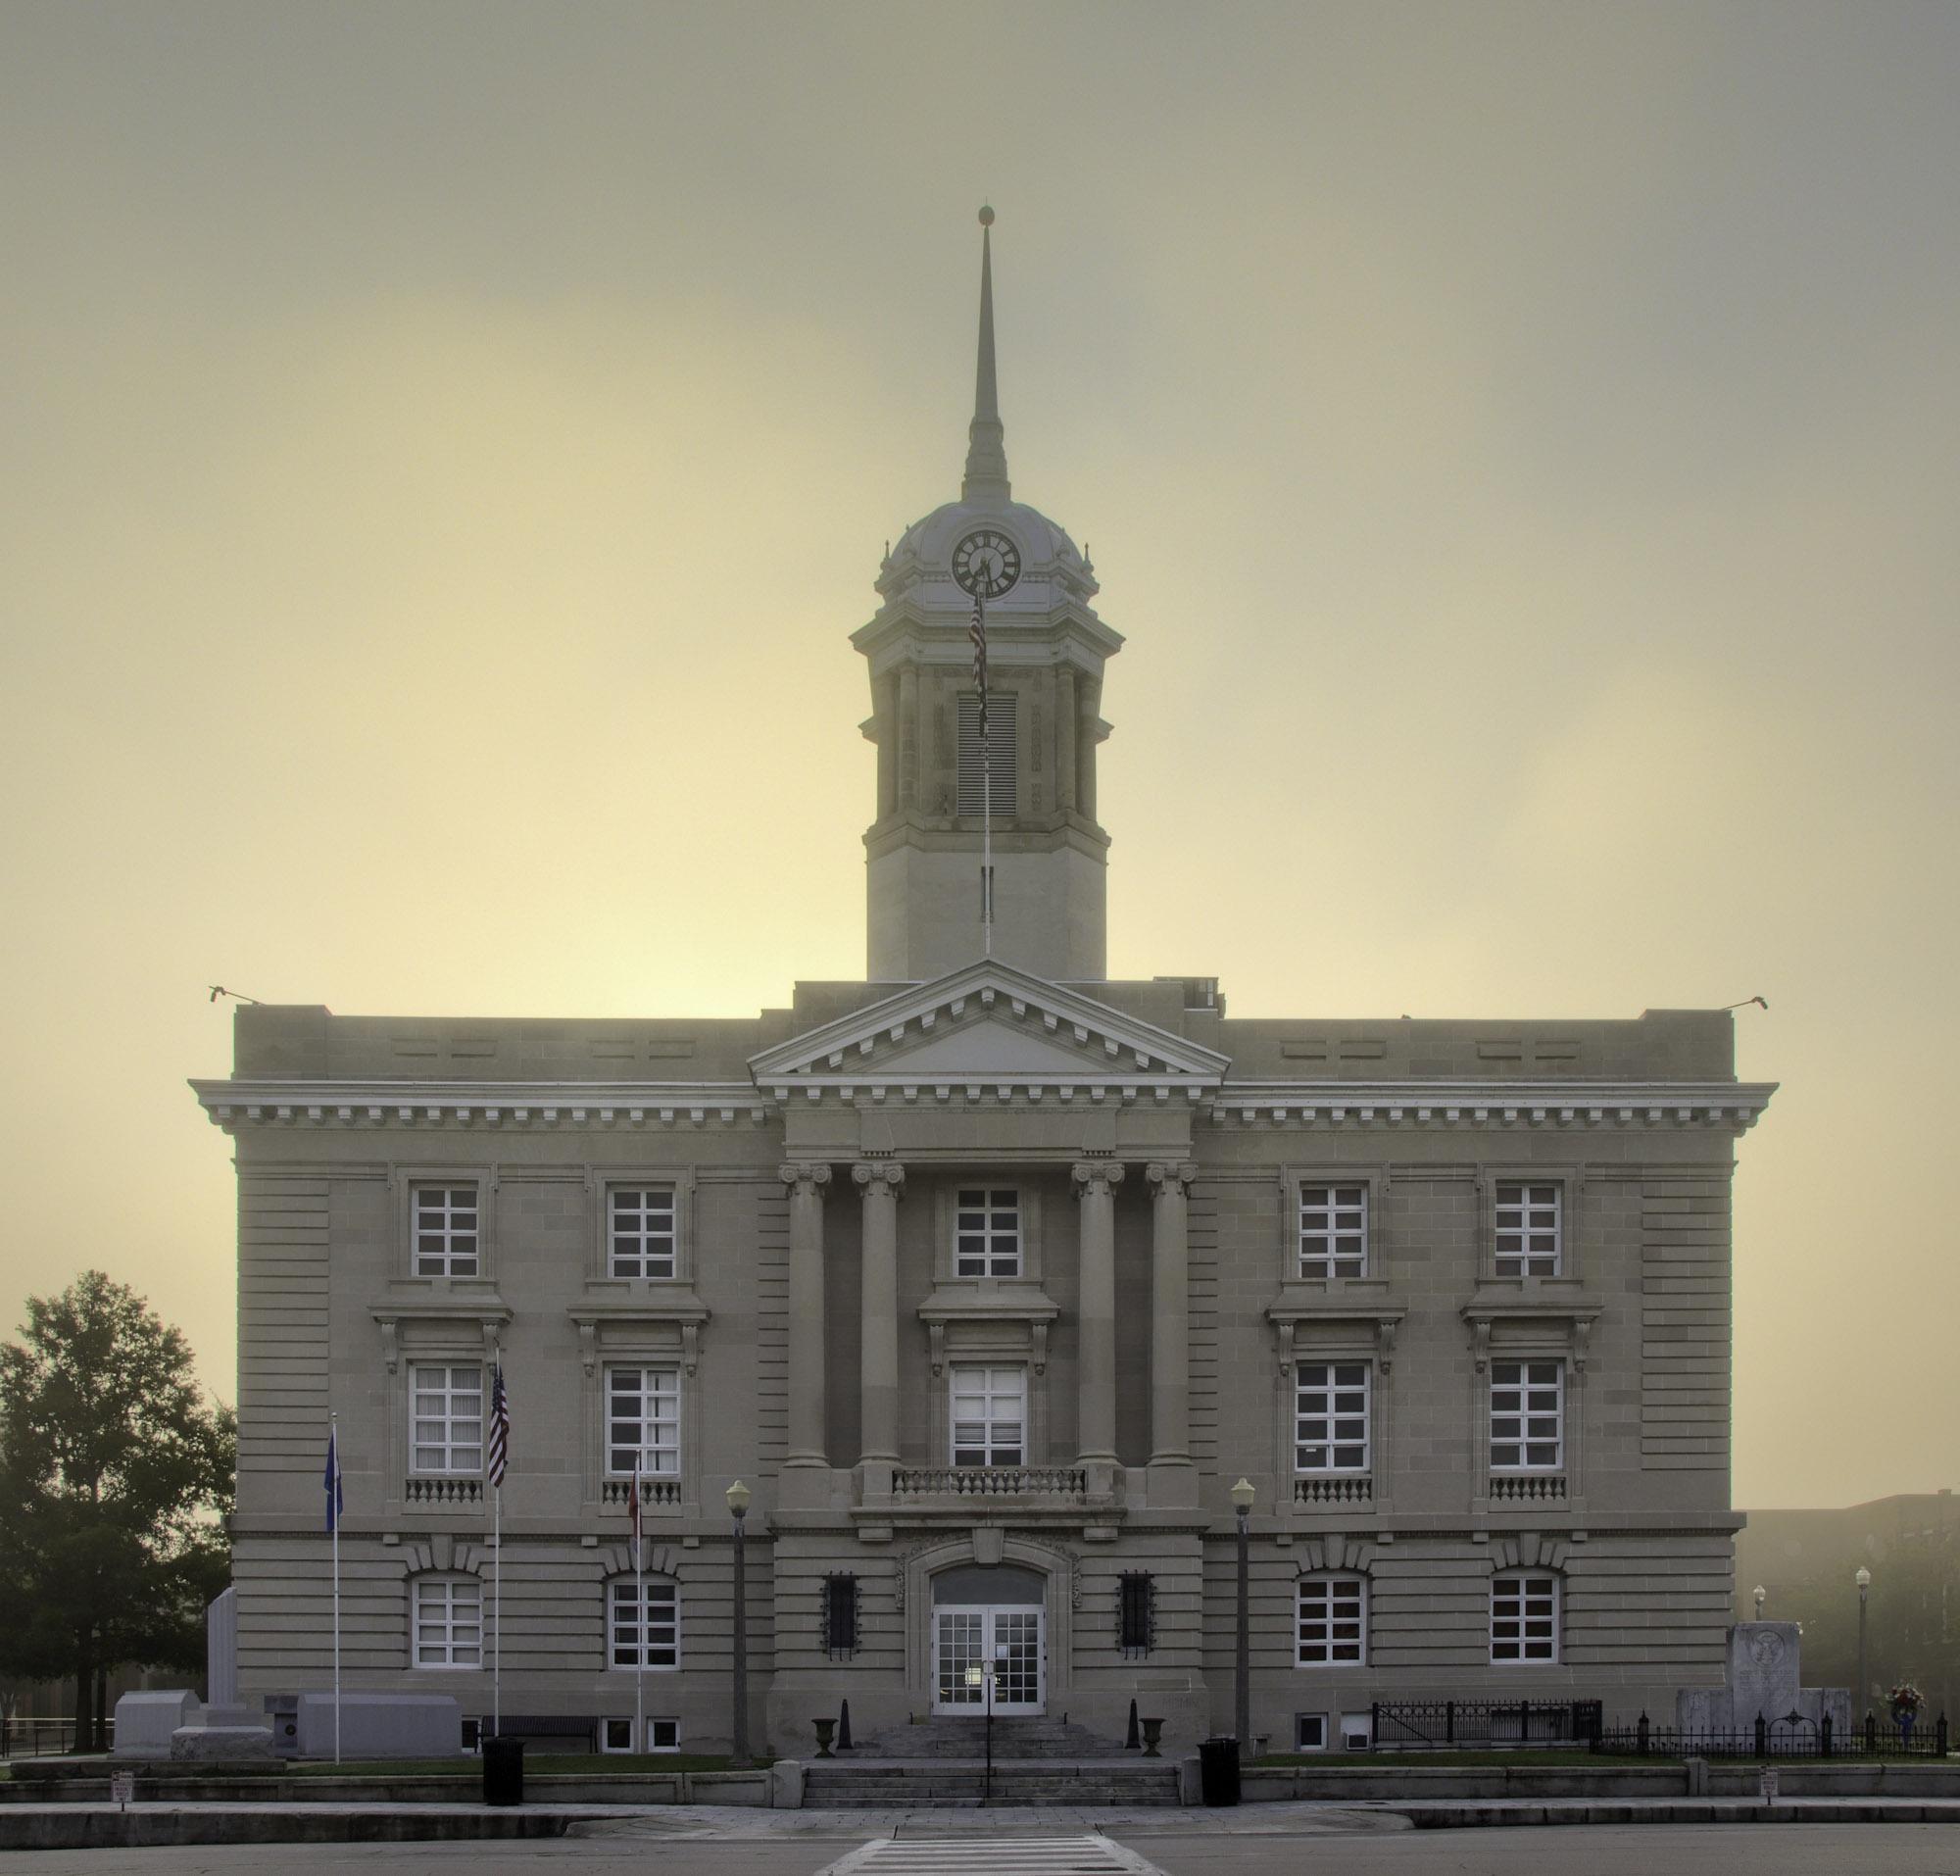 P9034679-HDR5-Courthouse-Back-Lit-Final-2_ShiftN-2.jpg